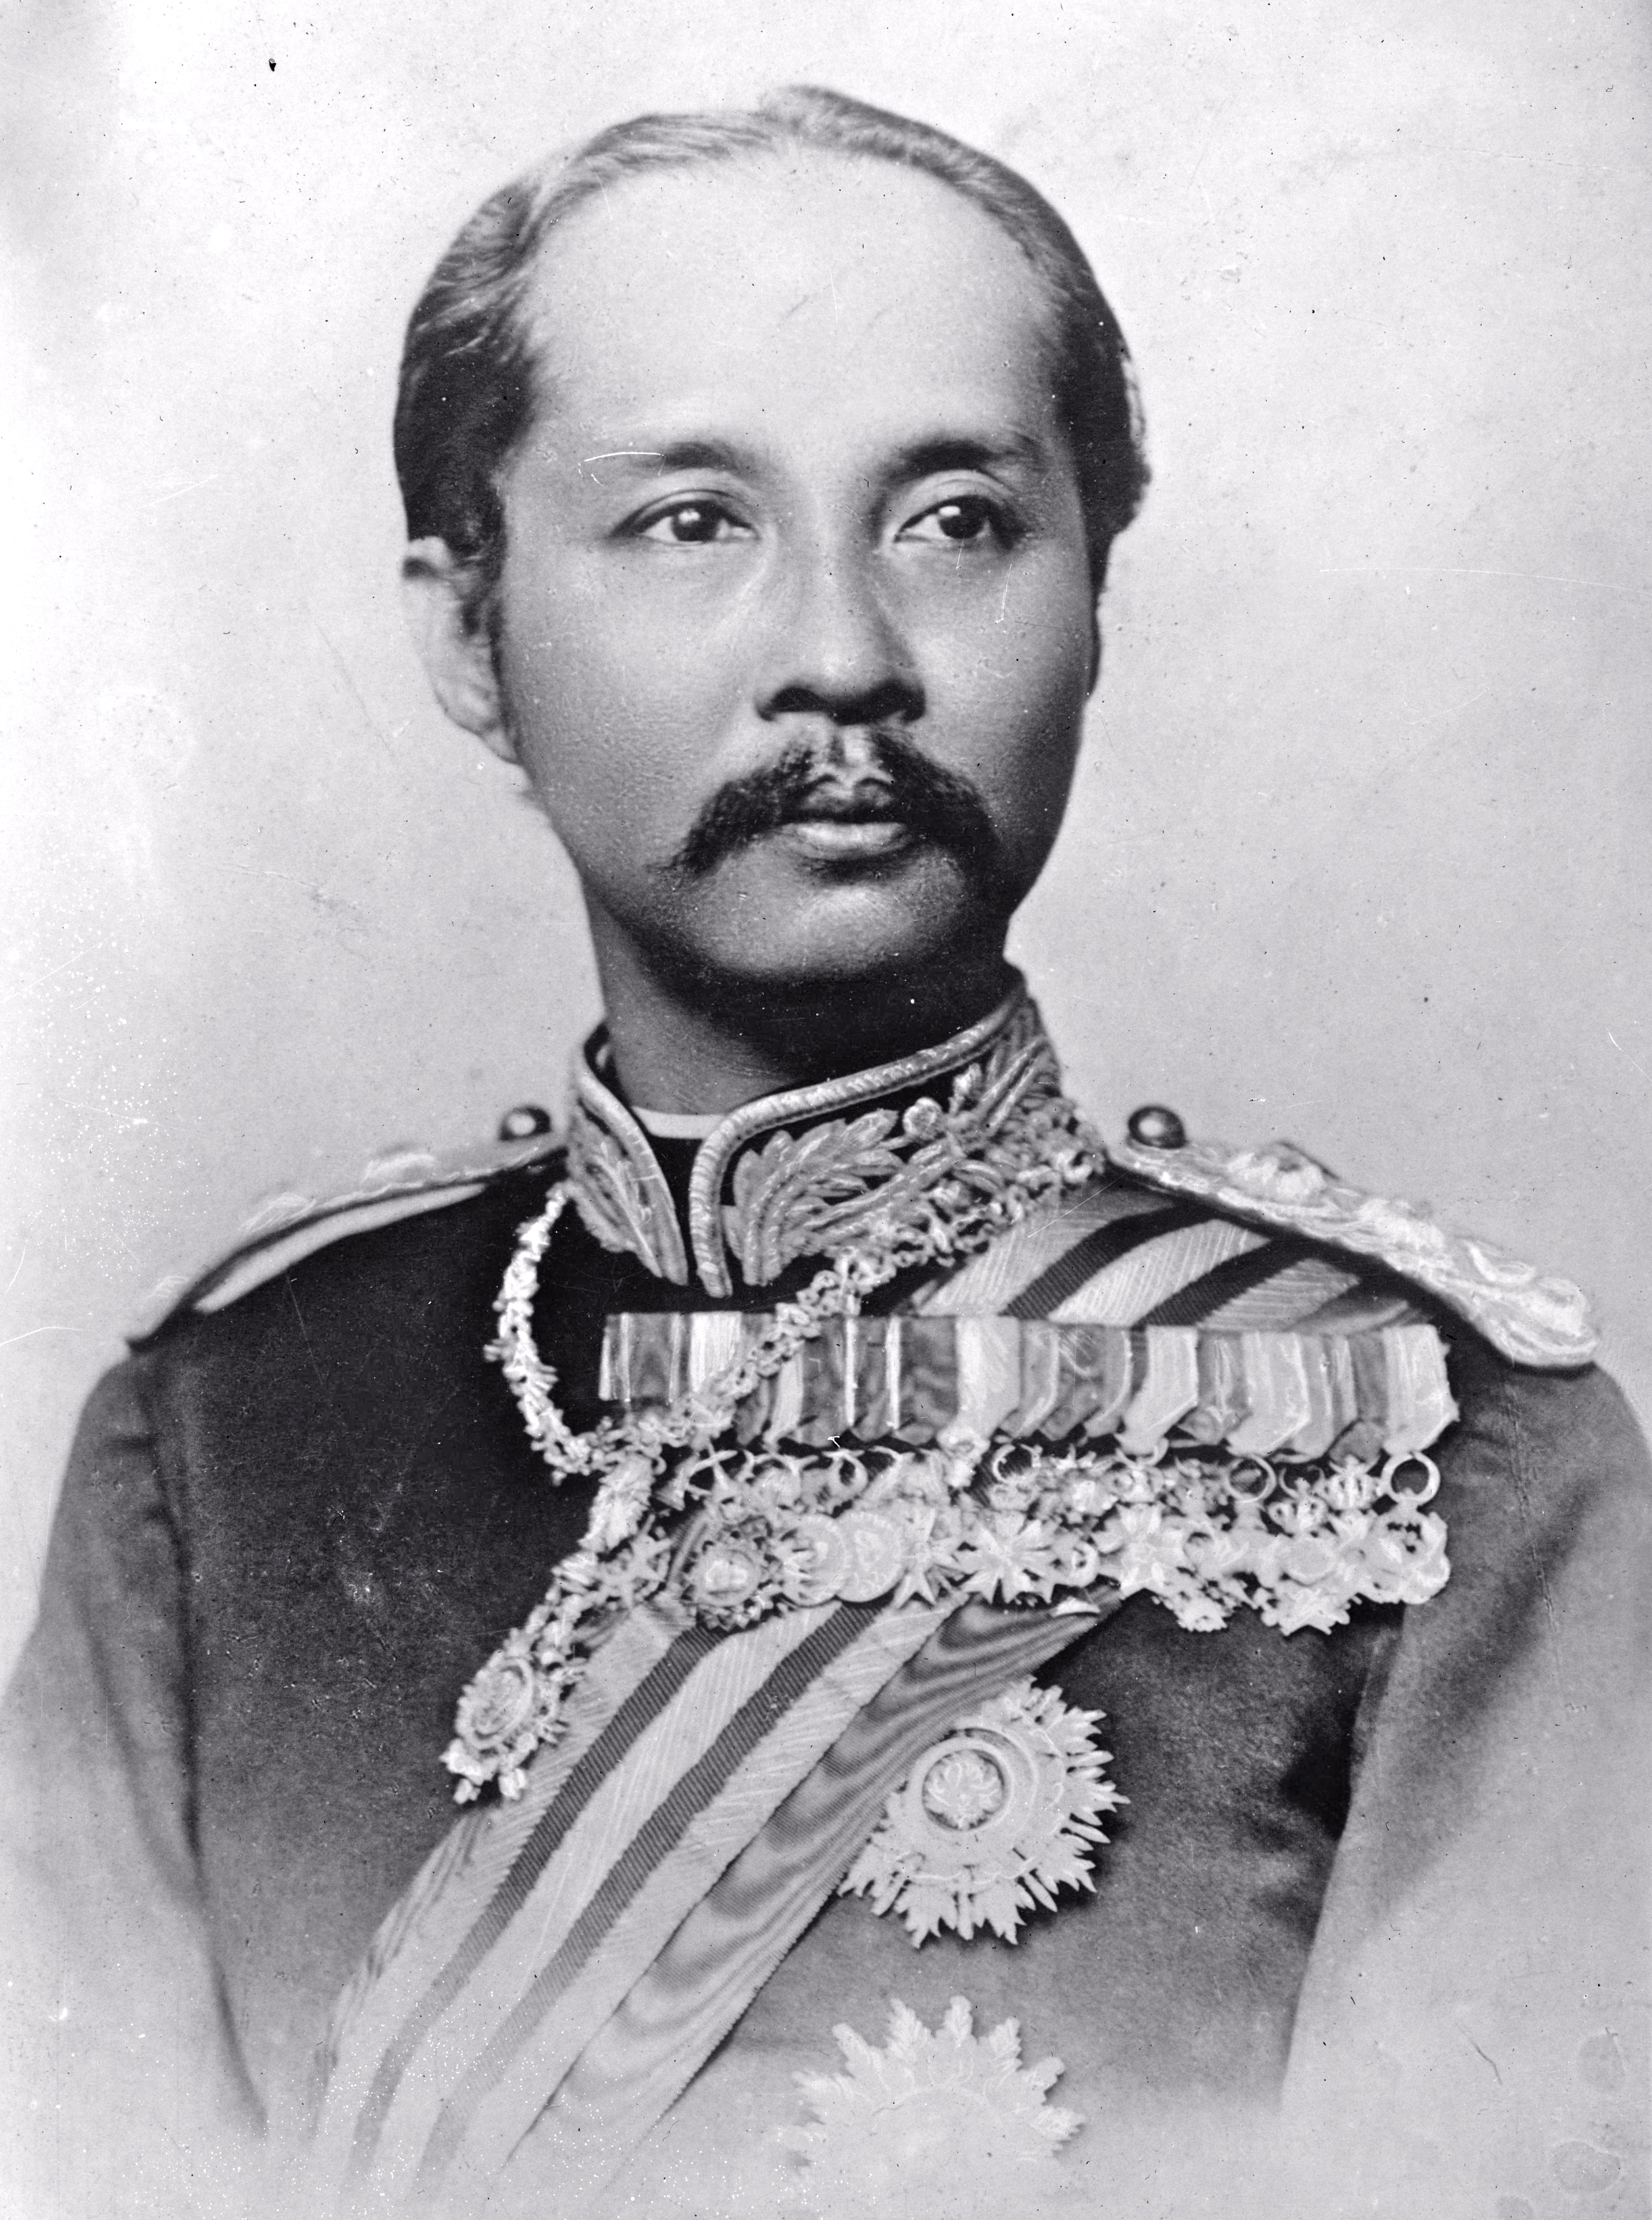 Kong Chulalongkorn